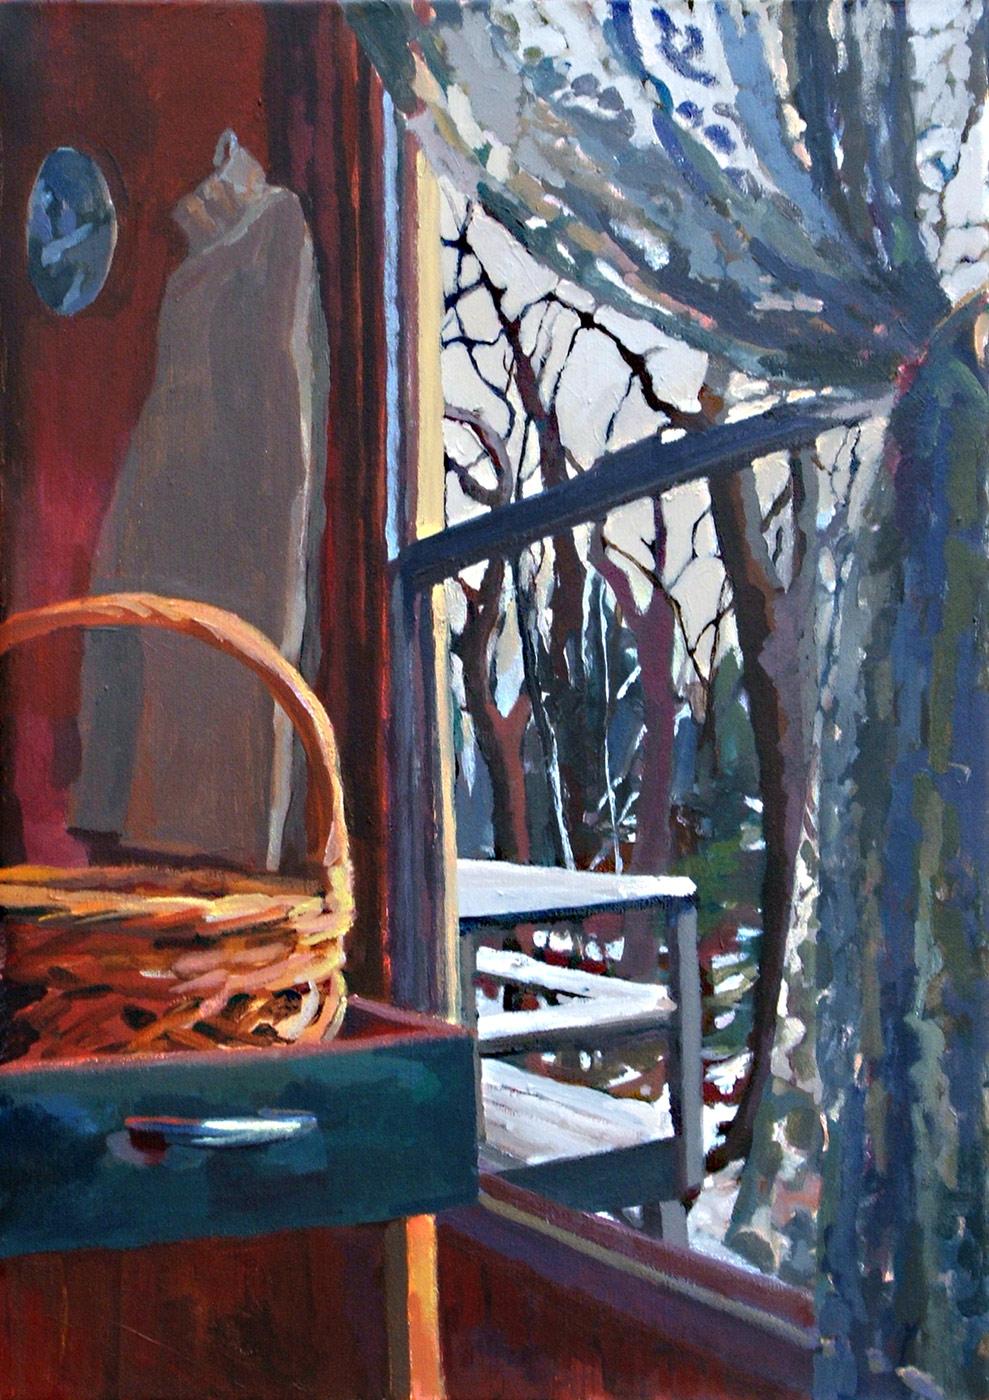 Steffens-Window-and-basket-card-web.jpg